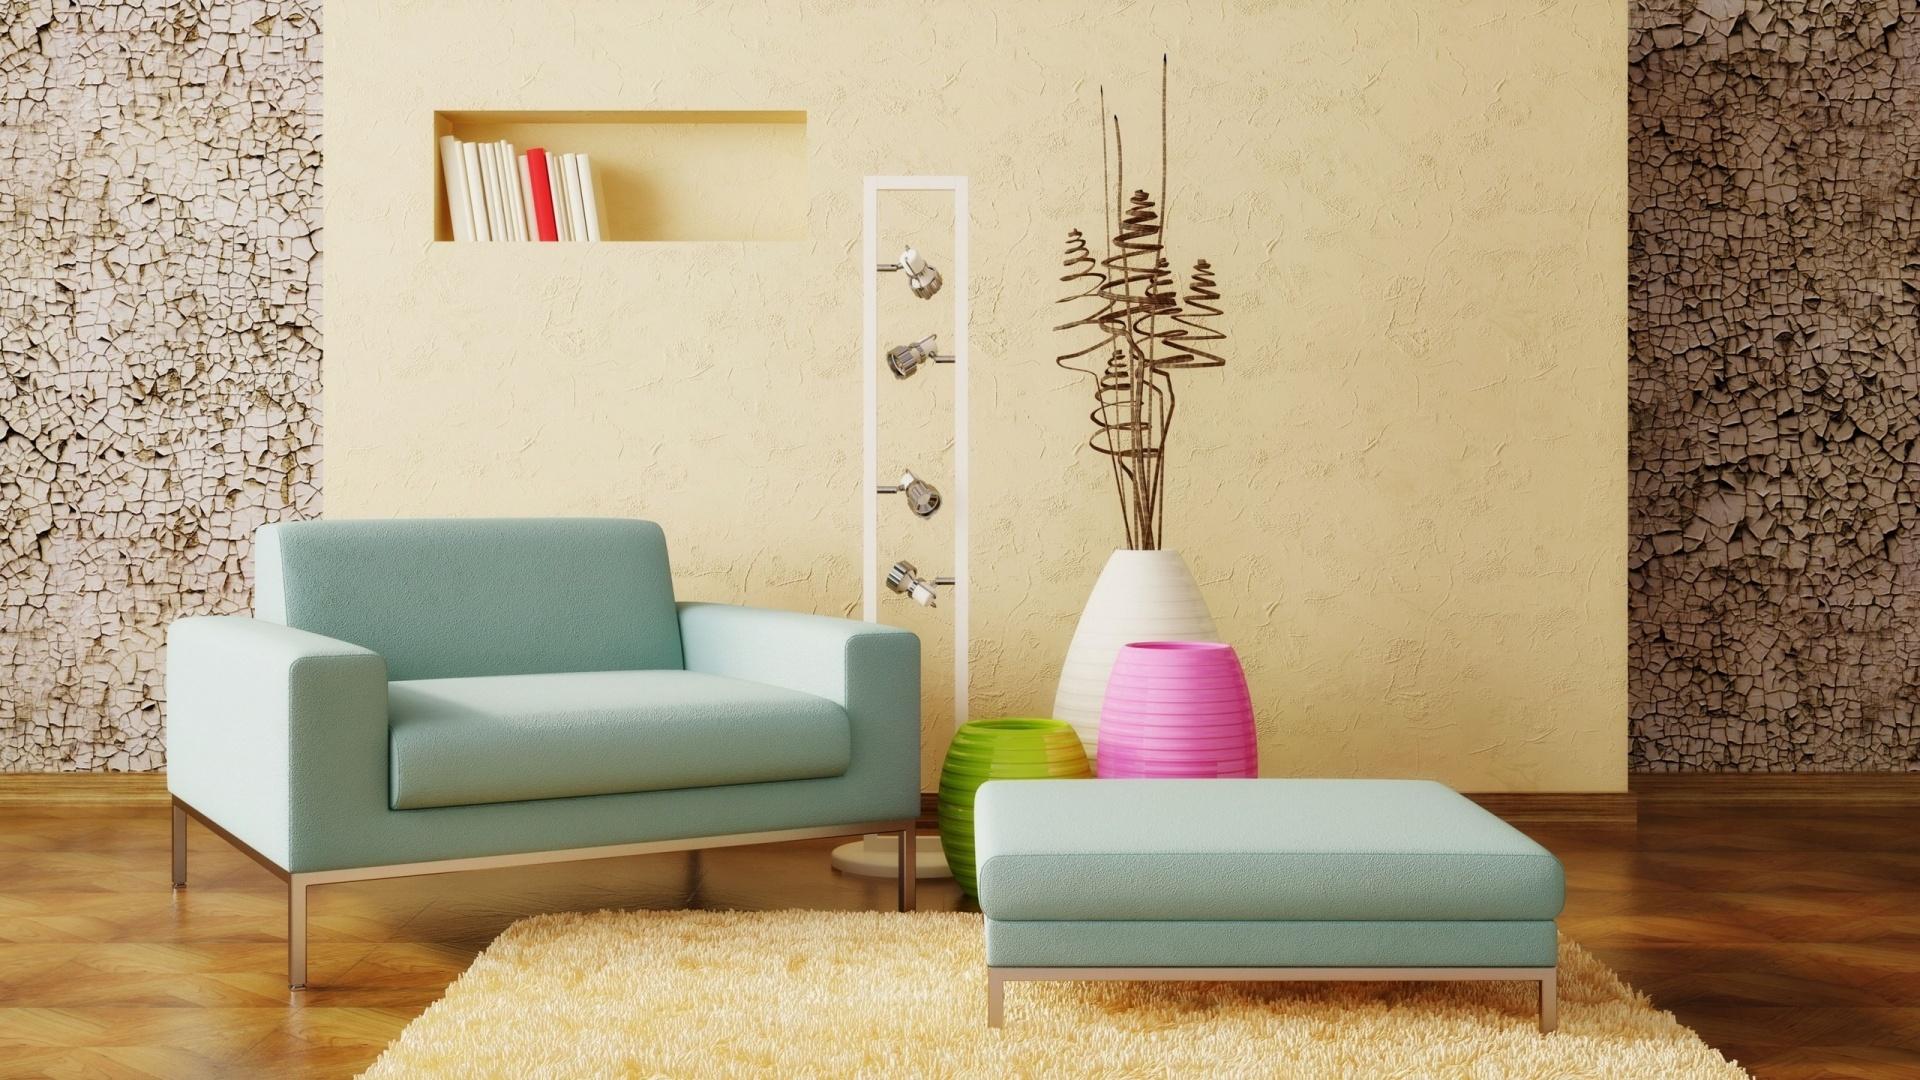 30 Modern Home Decor Ideas - The WoW Style